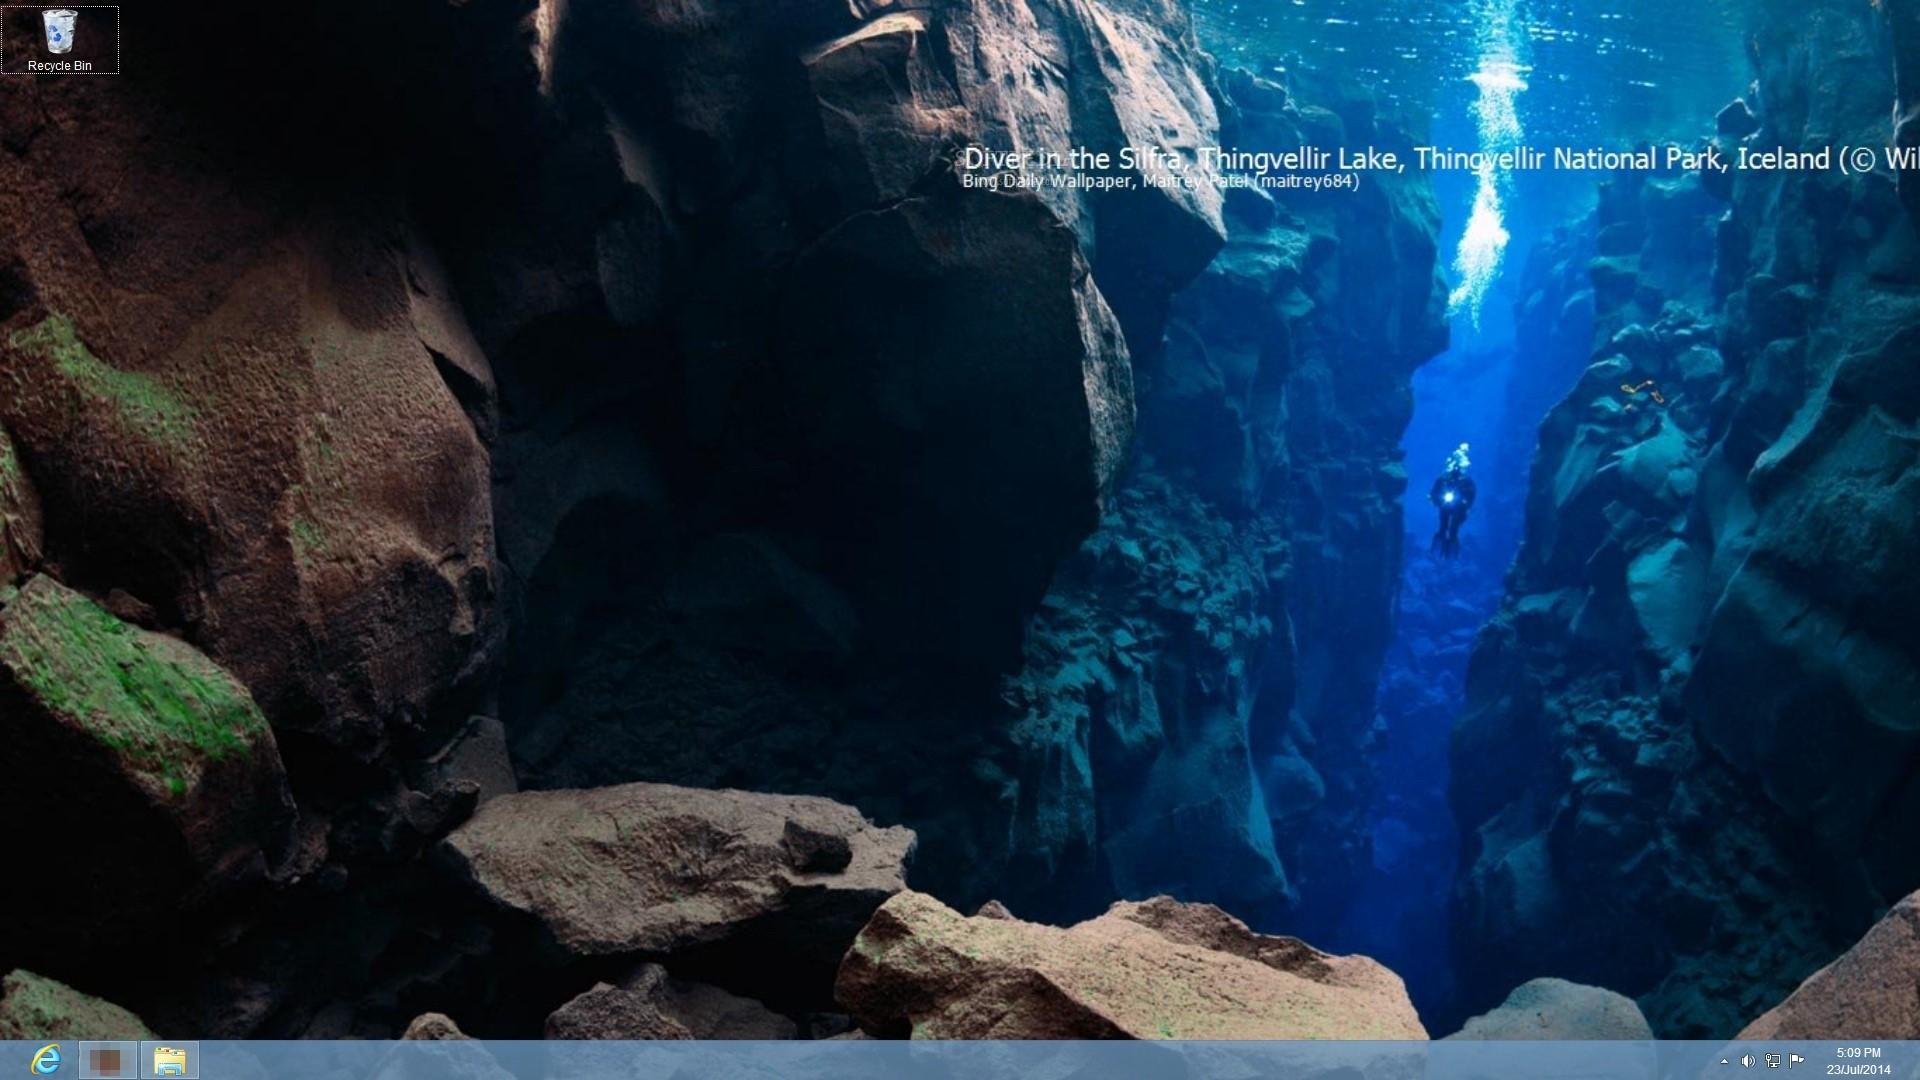 Bing Daily Wallpaper Windows 7 1920x1080